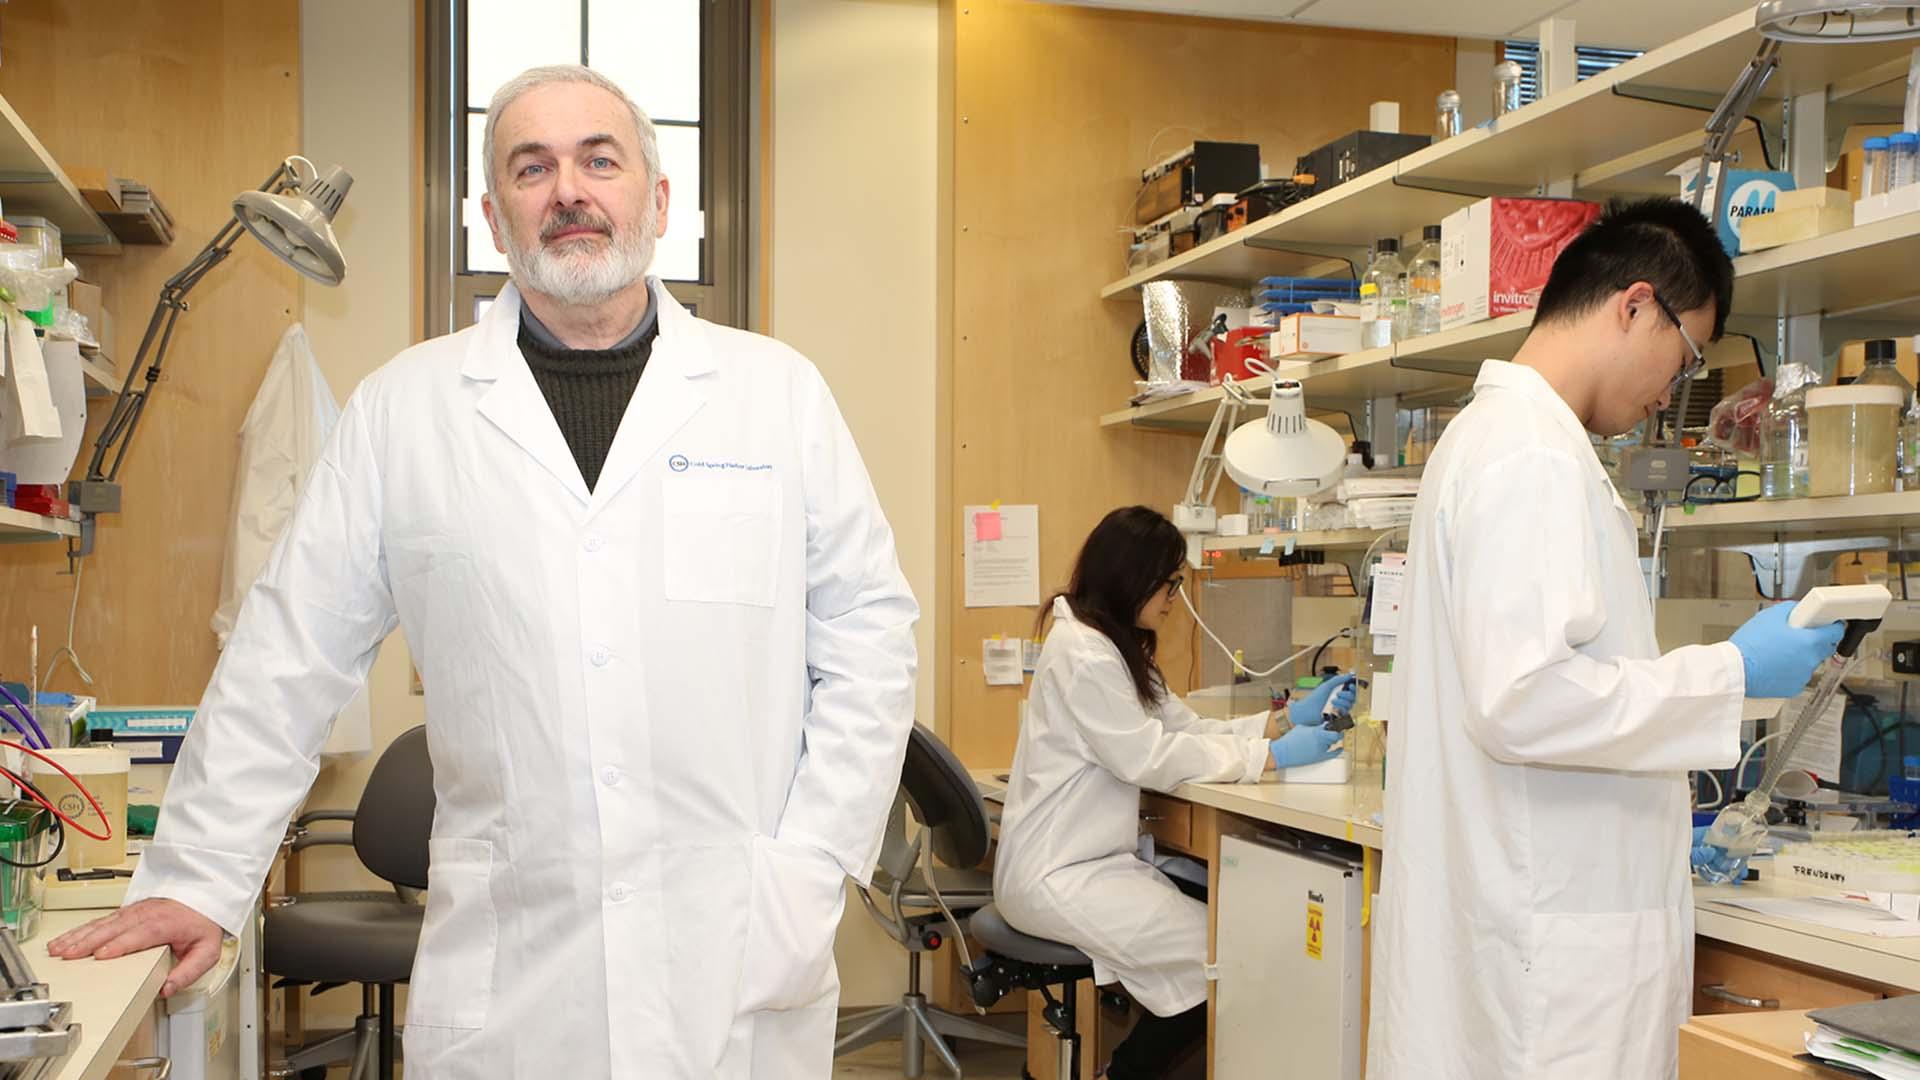 photo of Krainer in his lab